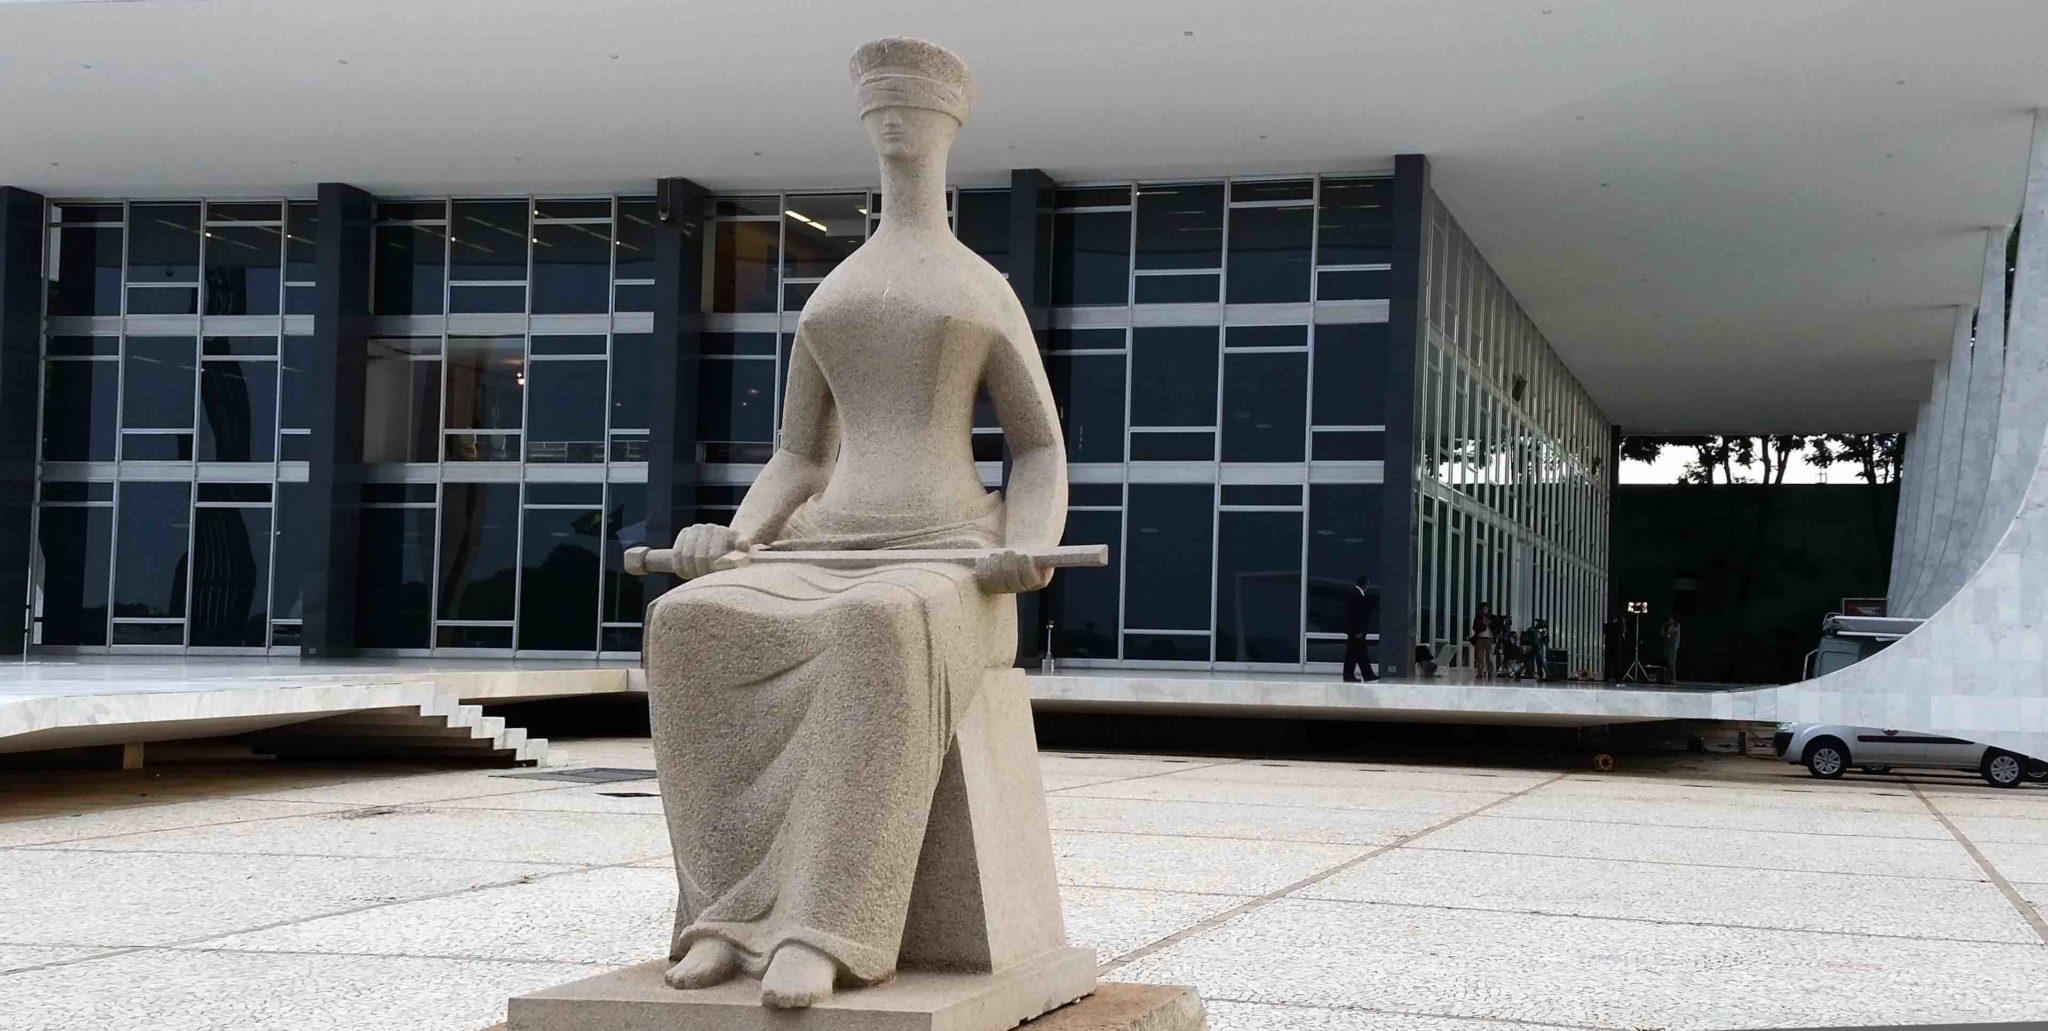 Brazil Supreme Court Justice system